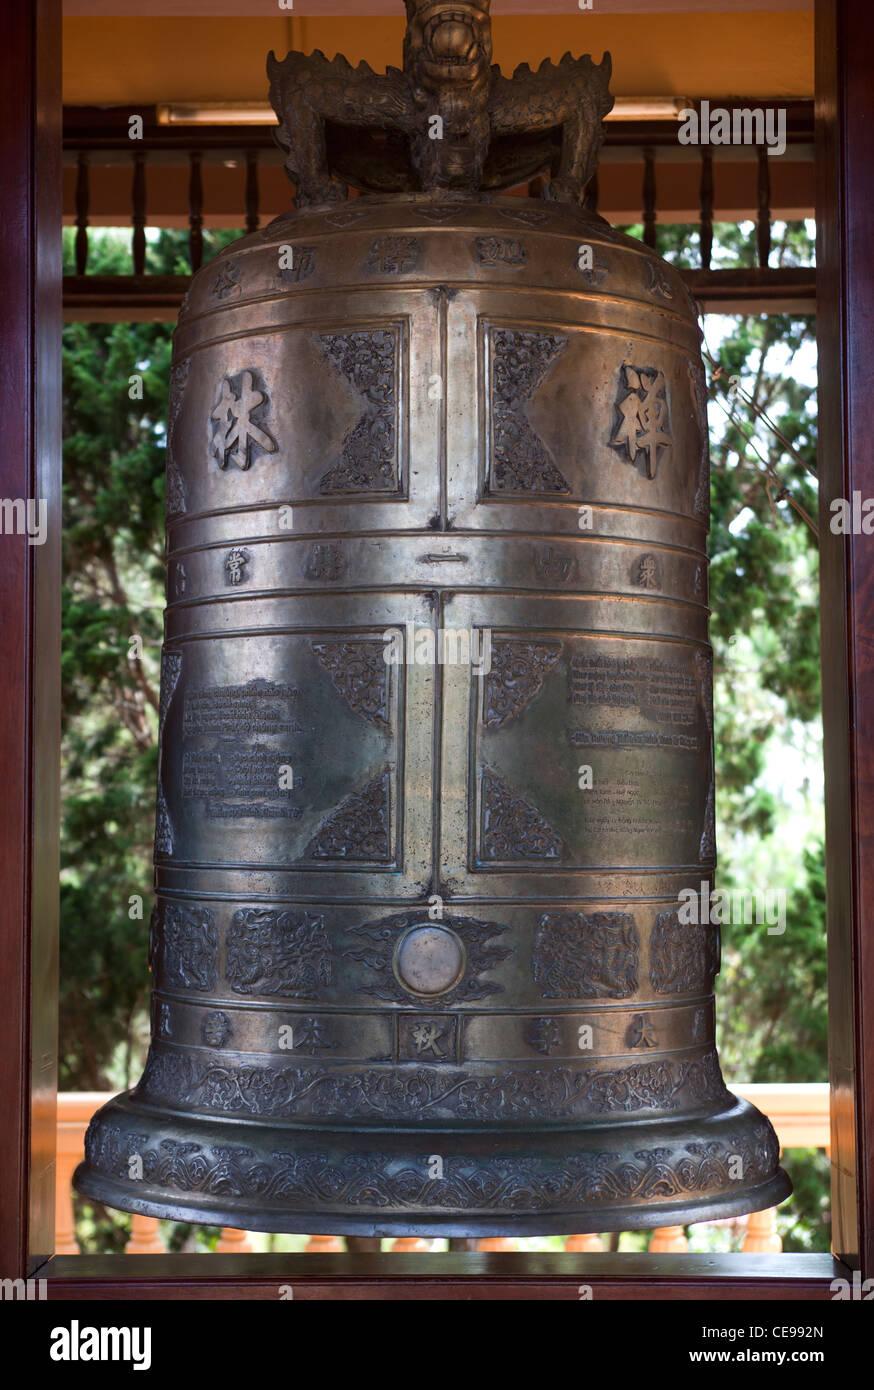 Ceremonial Bell Trúc Lâm Temple Dalat - Stock Image